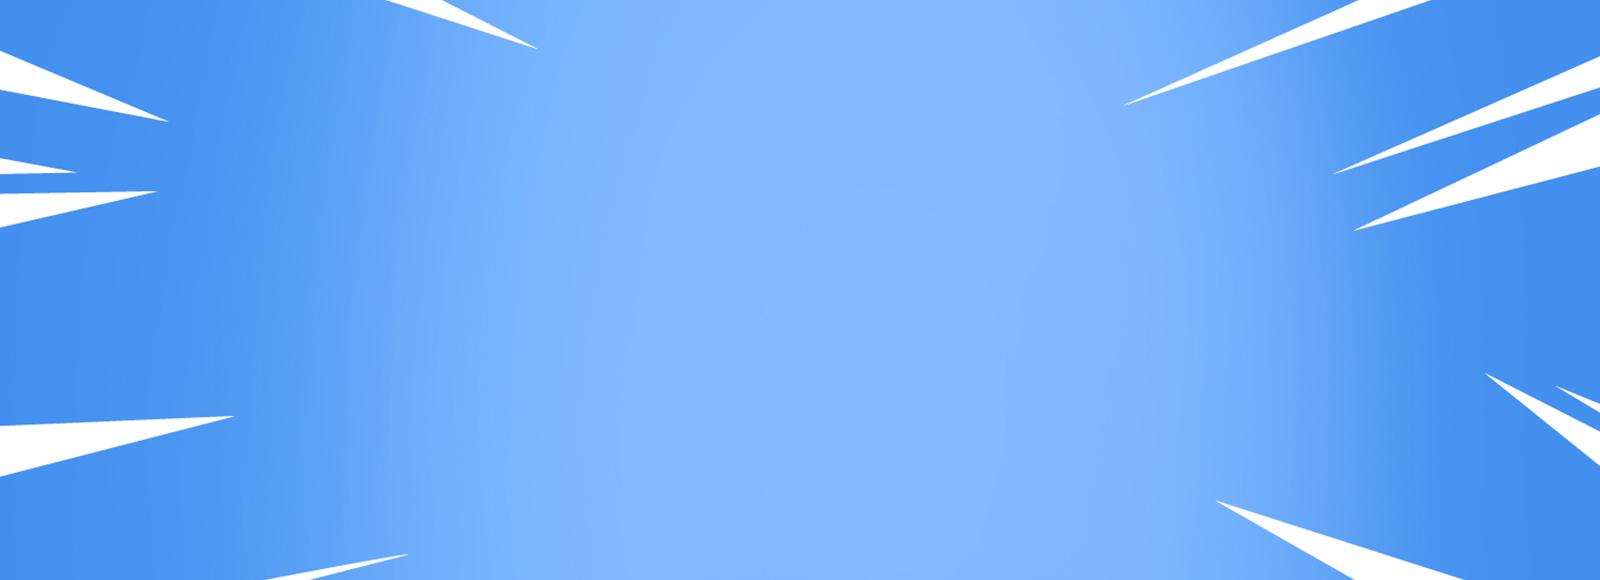 Fortnite Logo Blue Background | Aimbot Fortnite Que Es